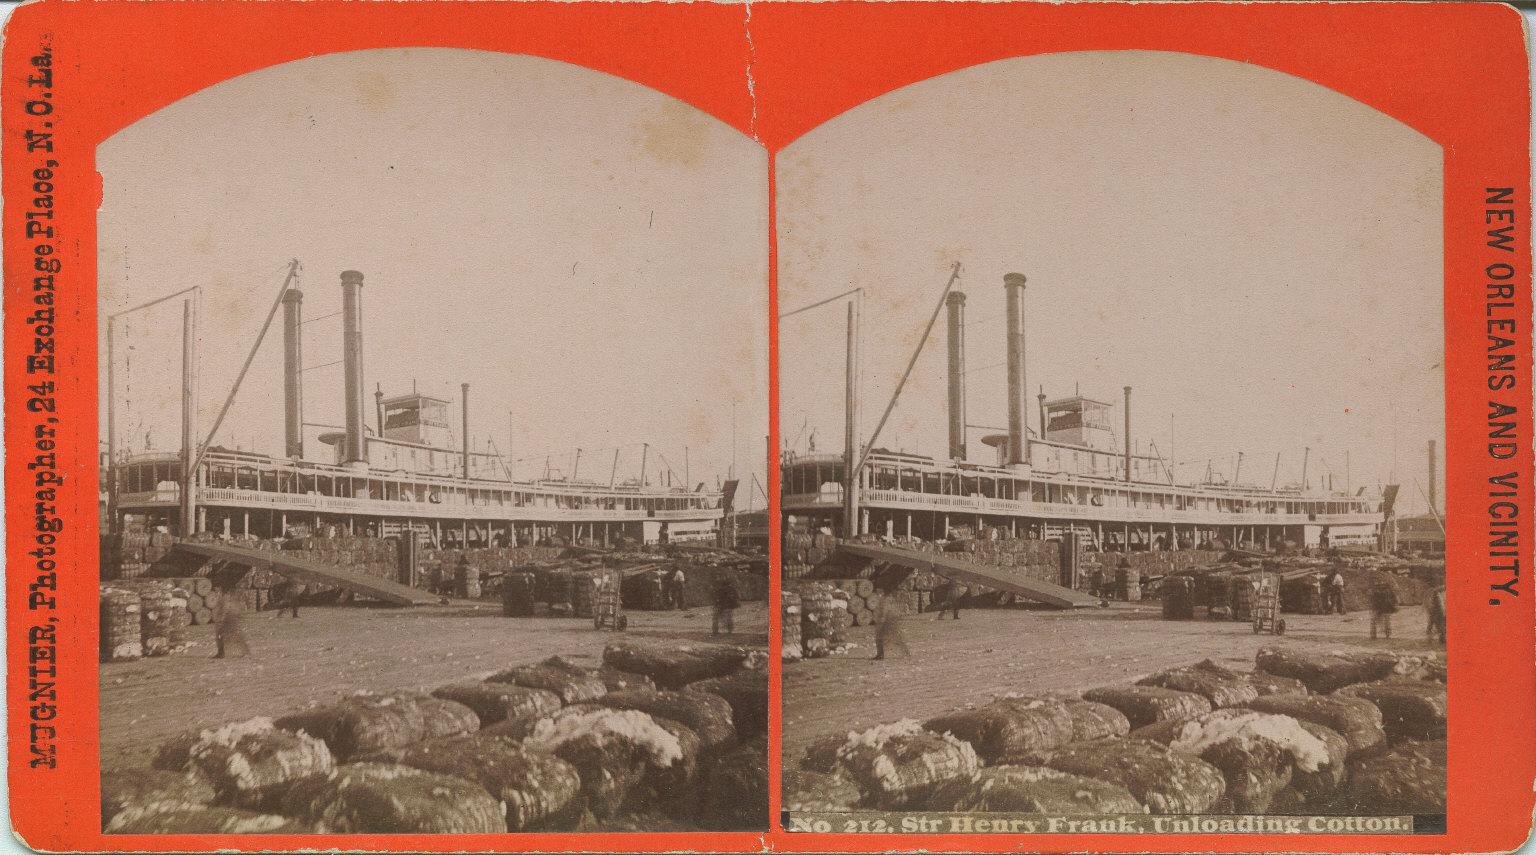 Sir Henry Frank unloading cotton